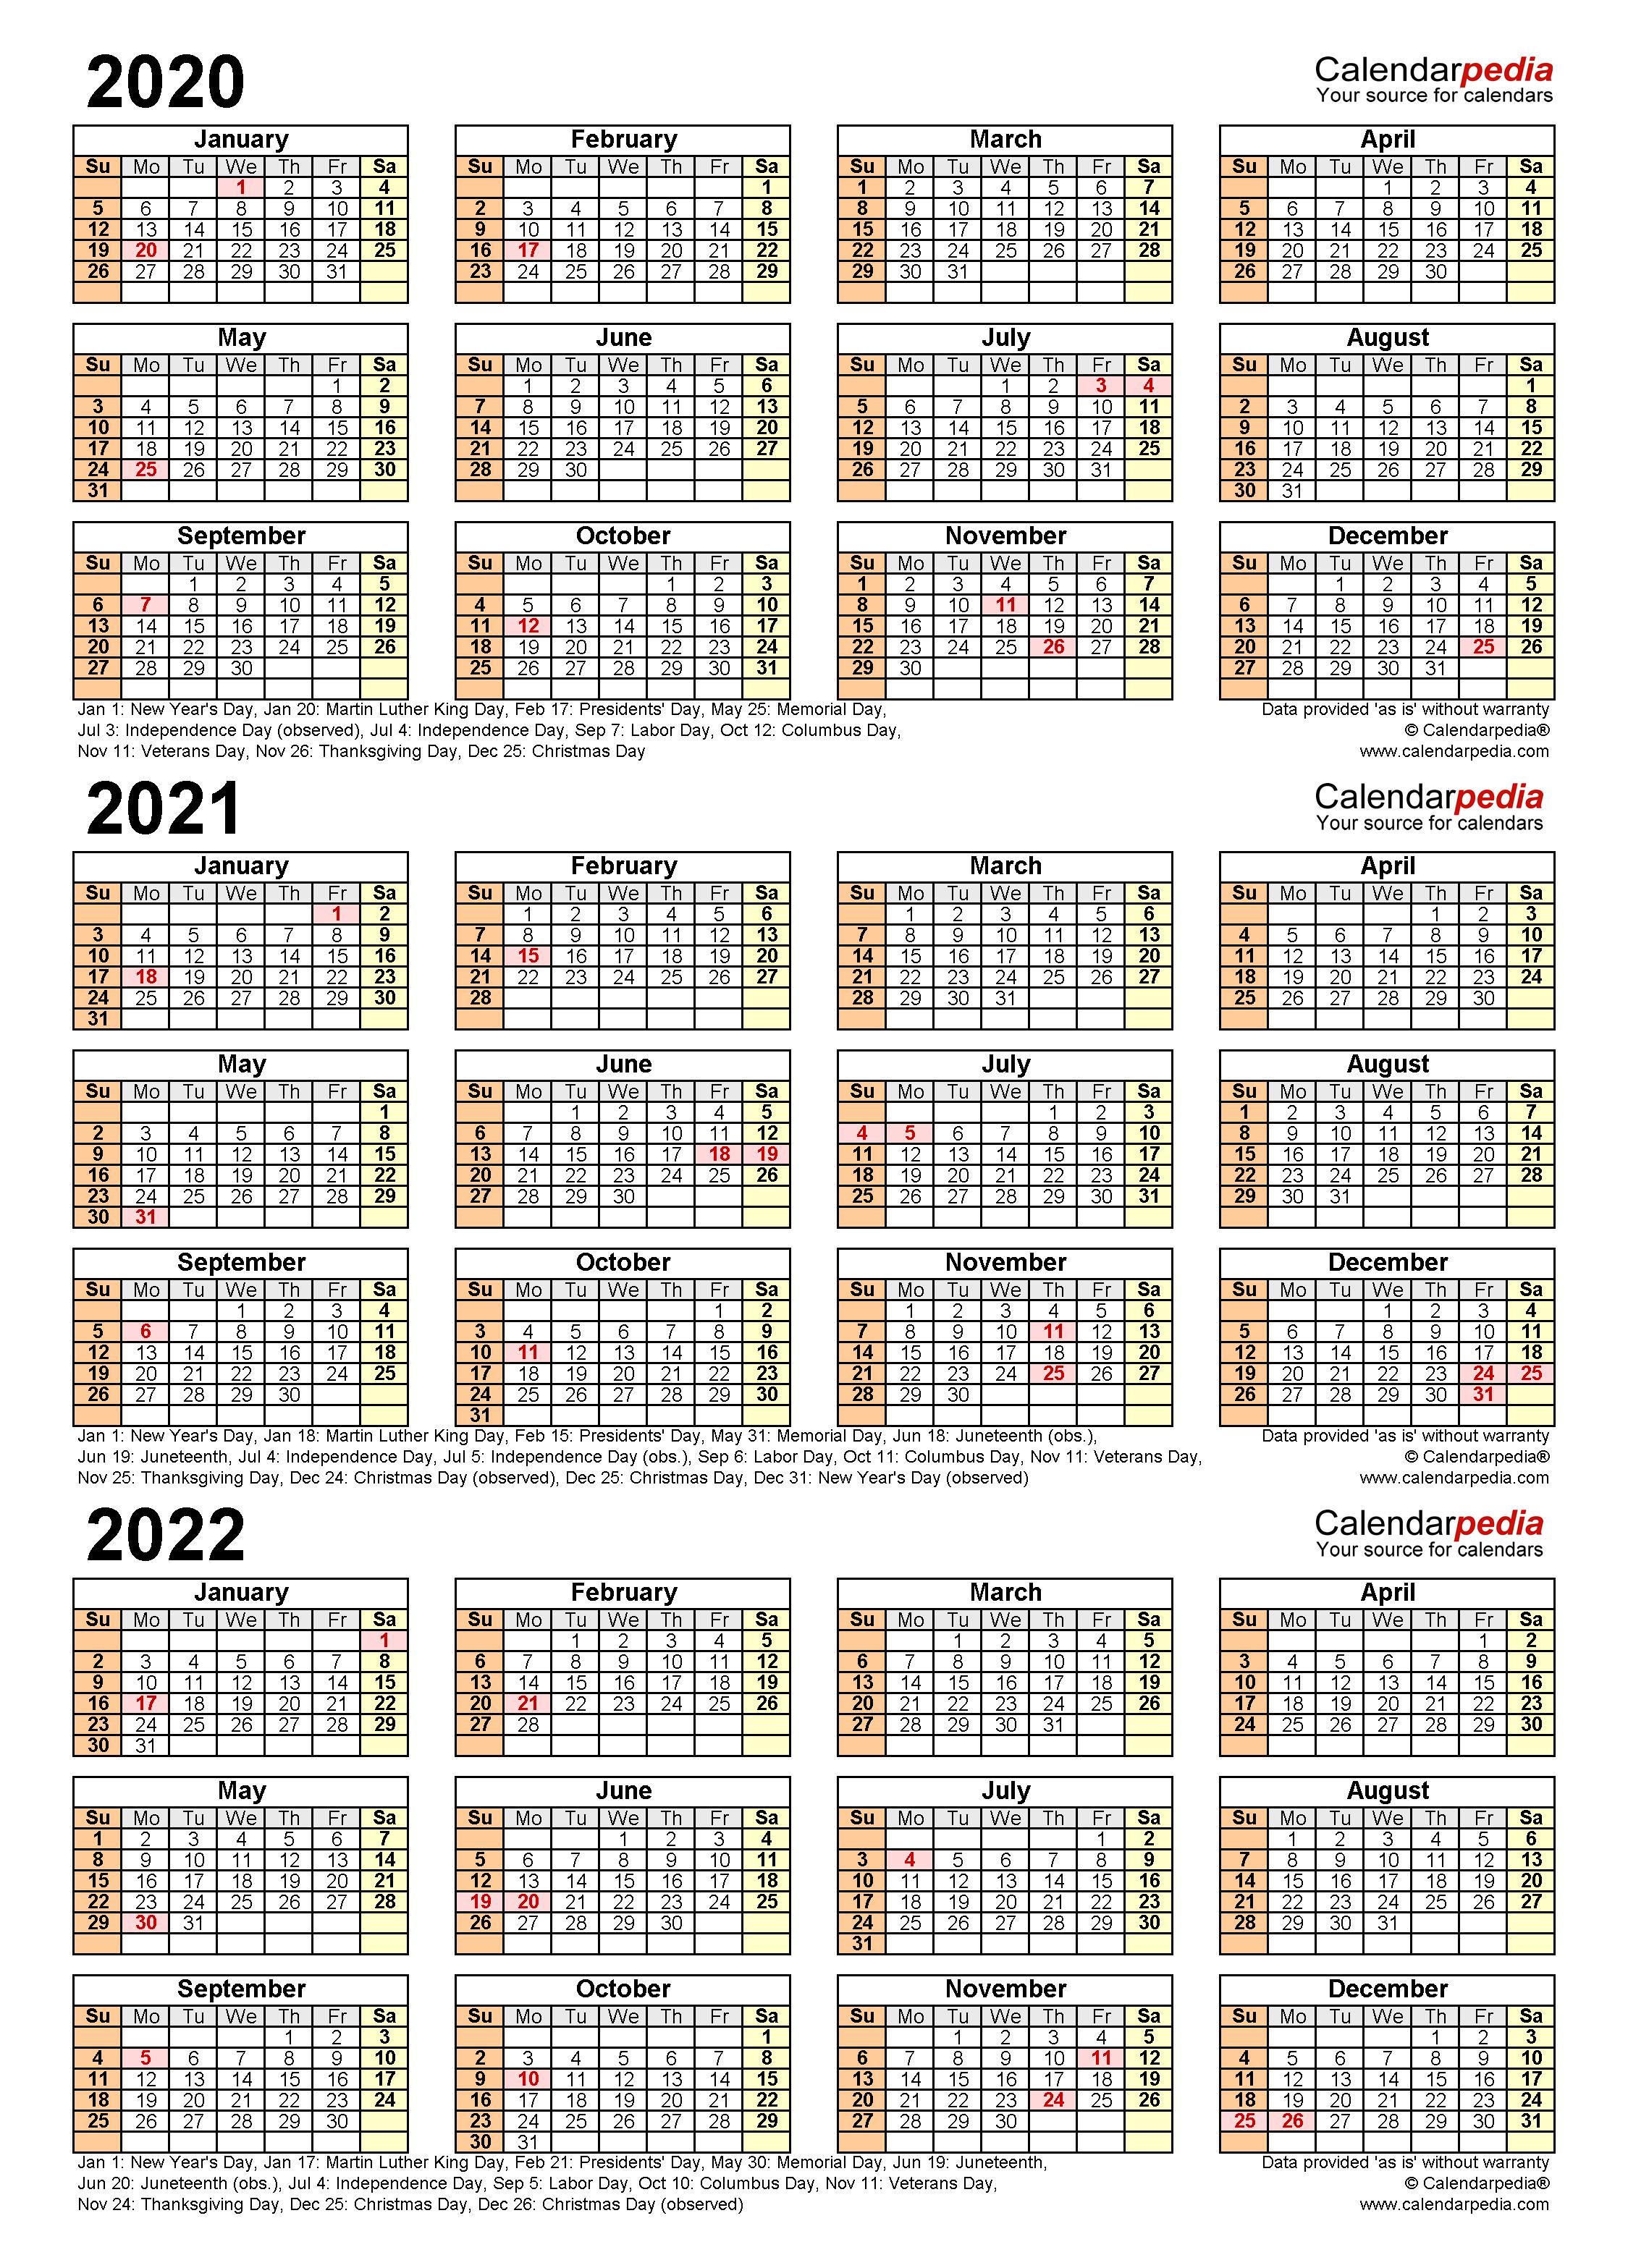 Vmi Calendar 2022.Calendar 2021 Vmi 2021 2022 Calendar